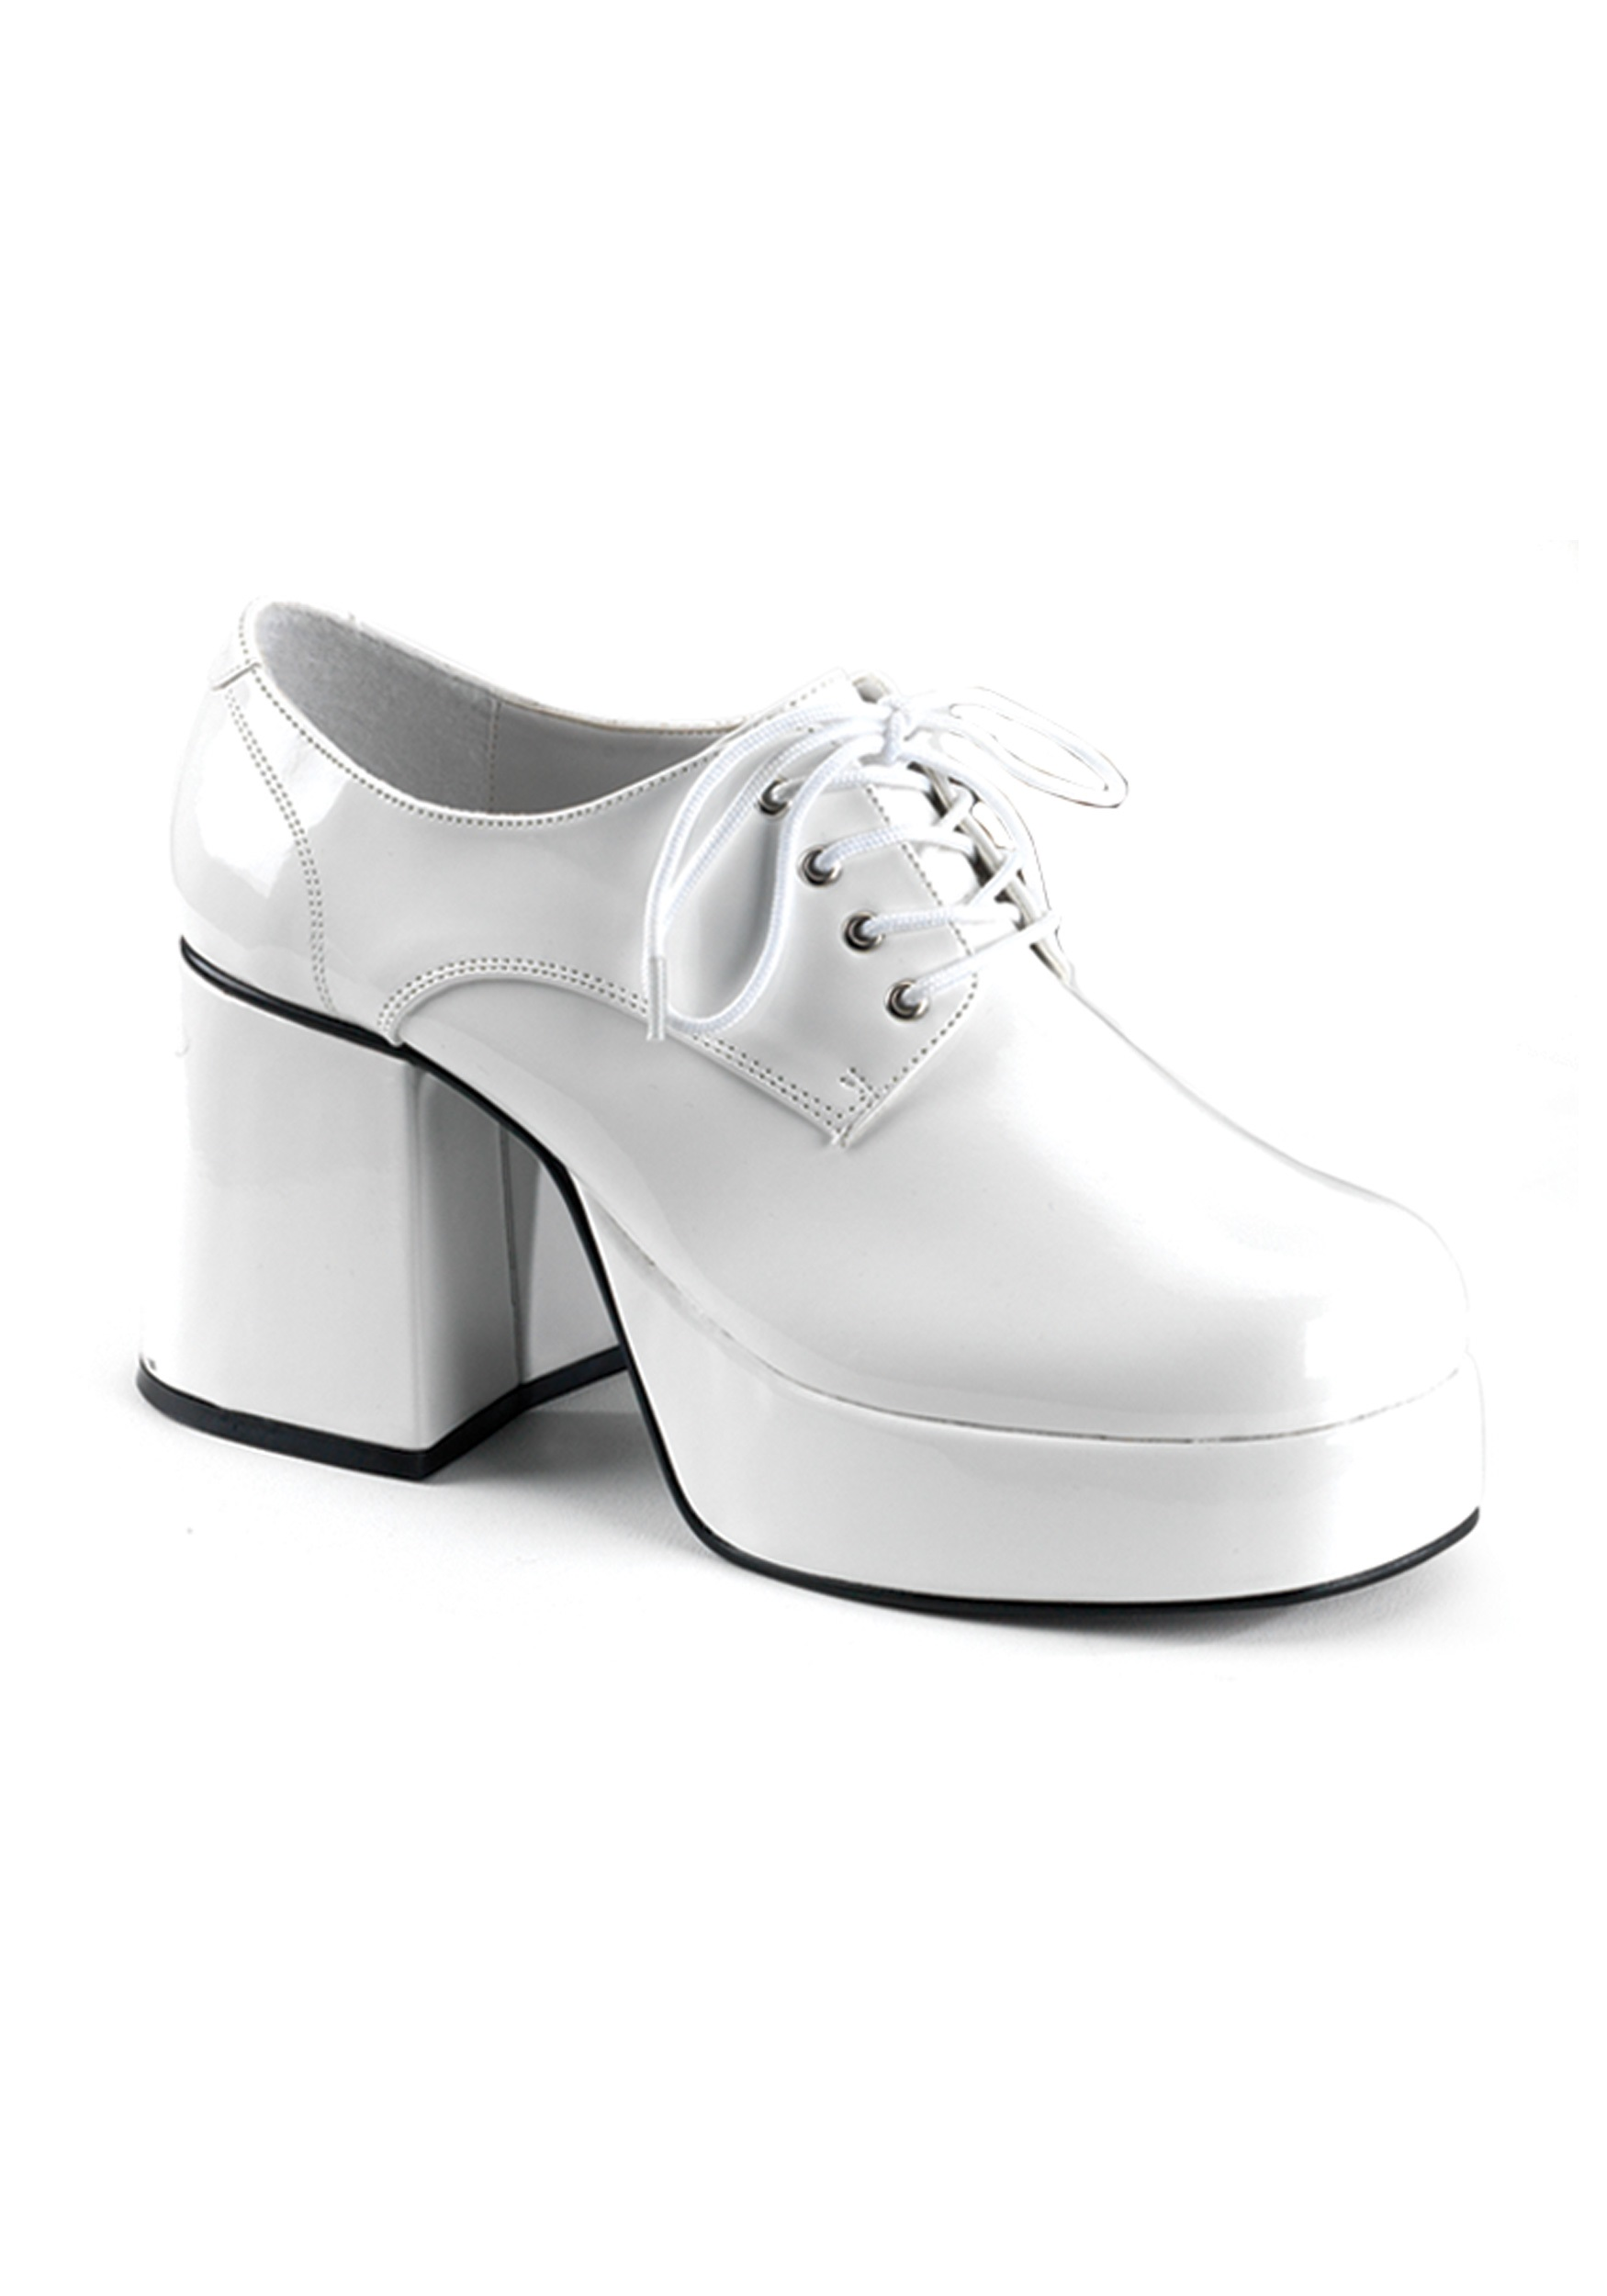 s platform shoes disco costume accessory